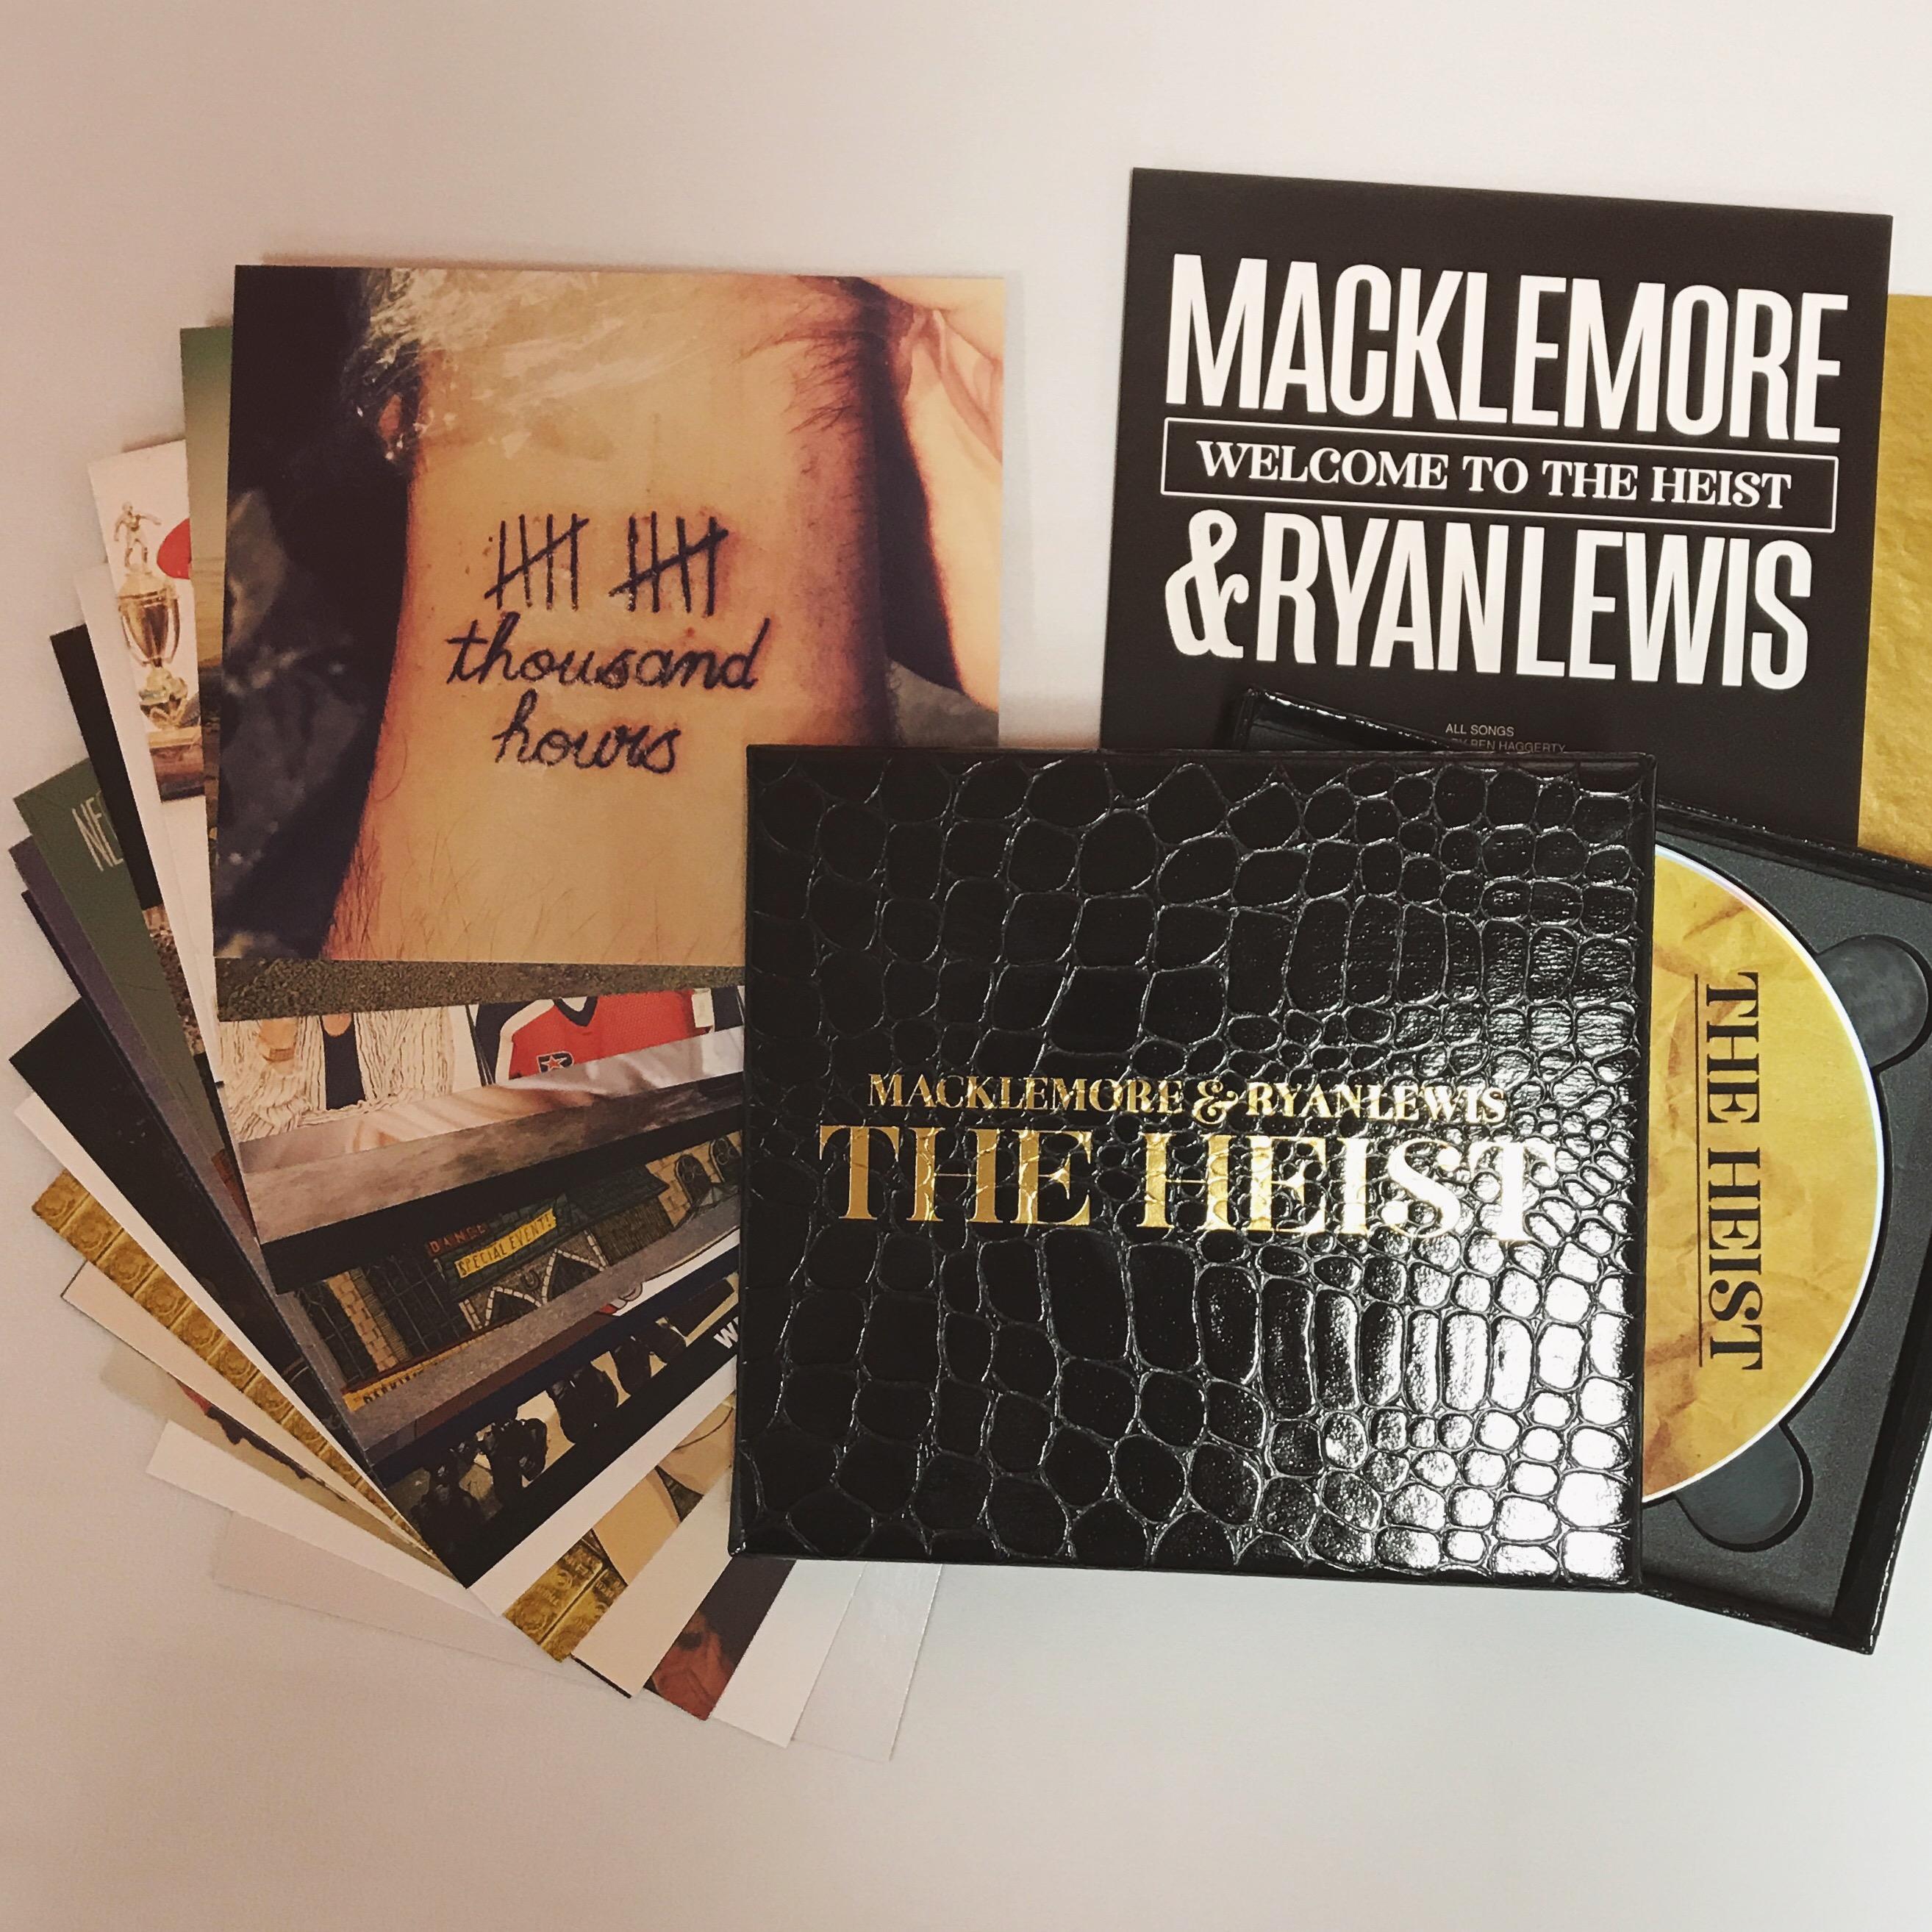 macklemore & ryan lewis the heist album download